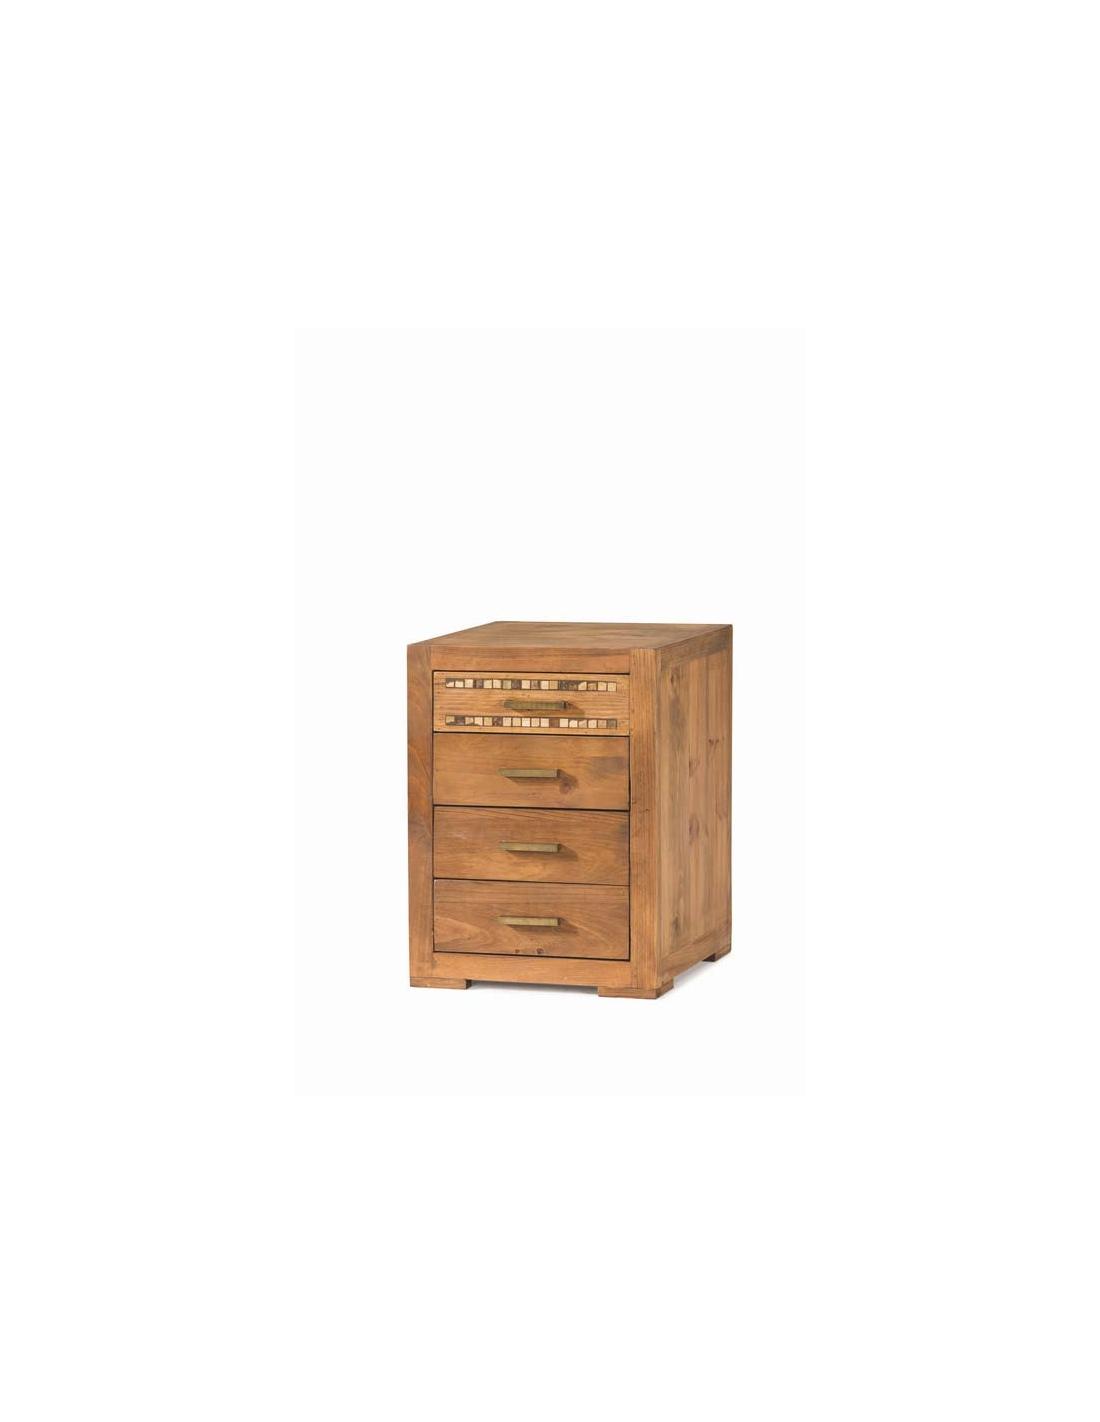 Comprar mesita de noche rustica madera natural modular studio - Mesitas de noche de madera ...